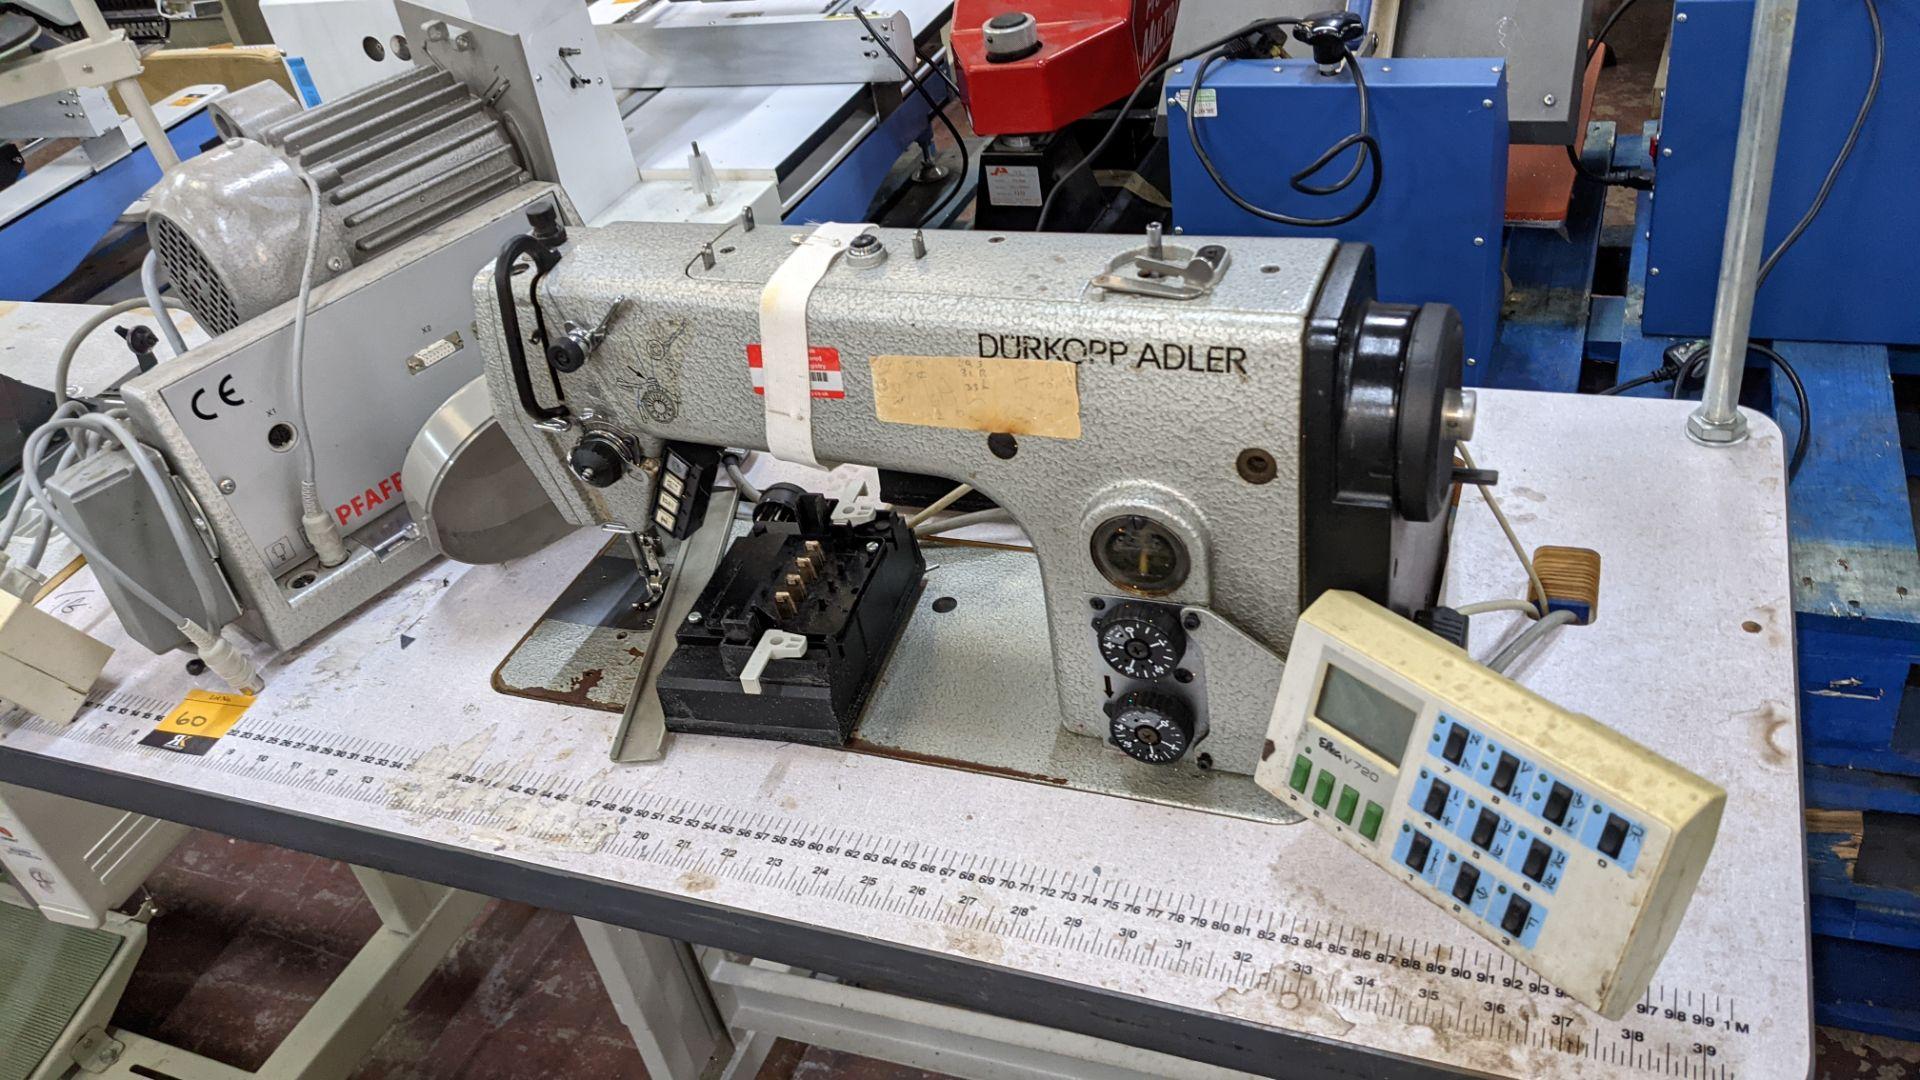 Durkopp Adler type 0271-L40042 sewing machine - Image 5 of 19